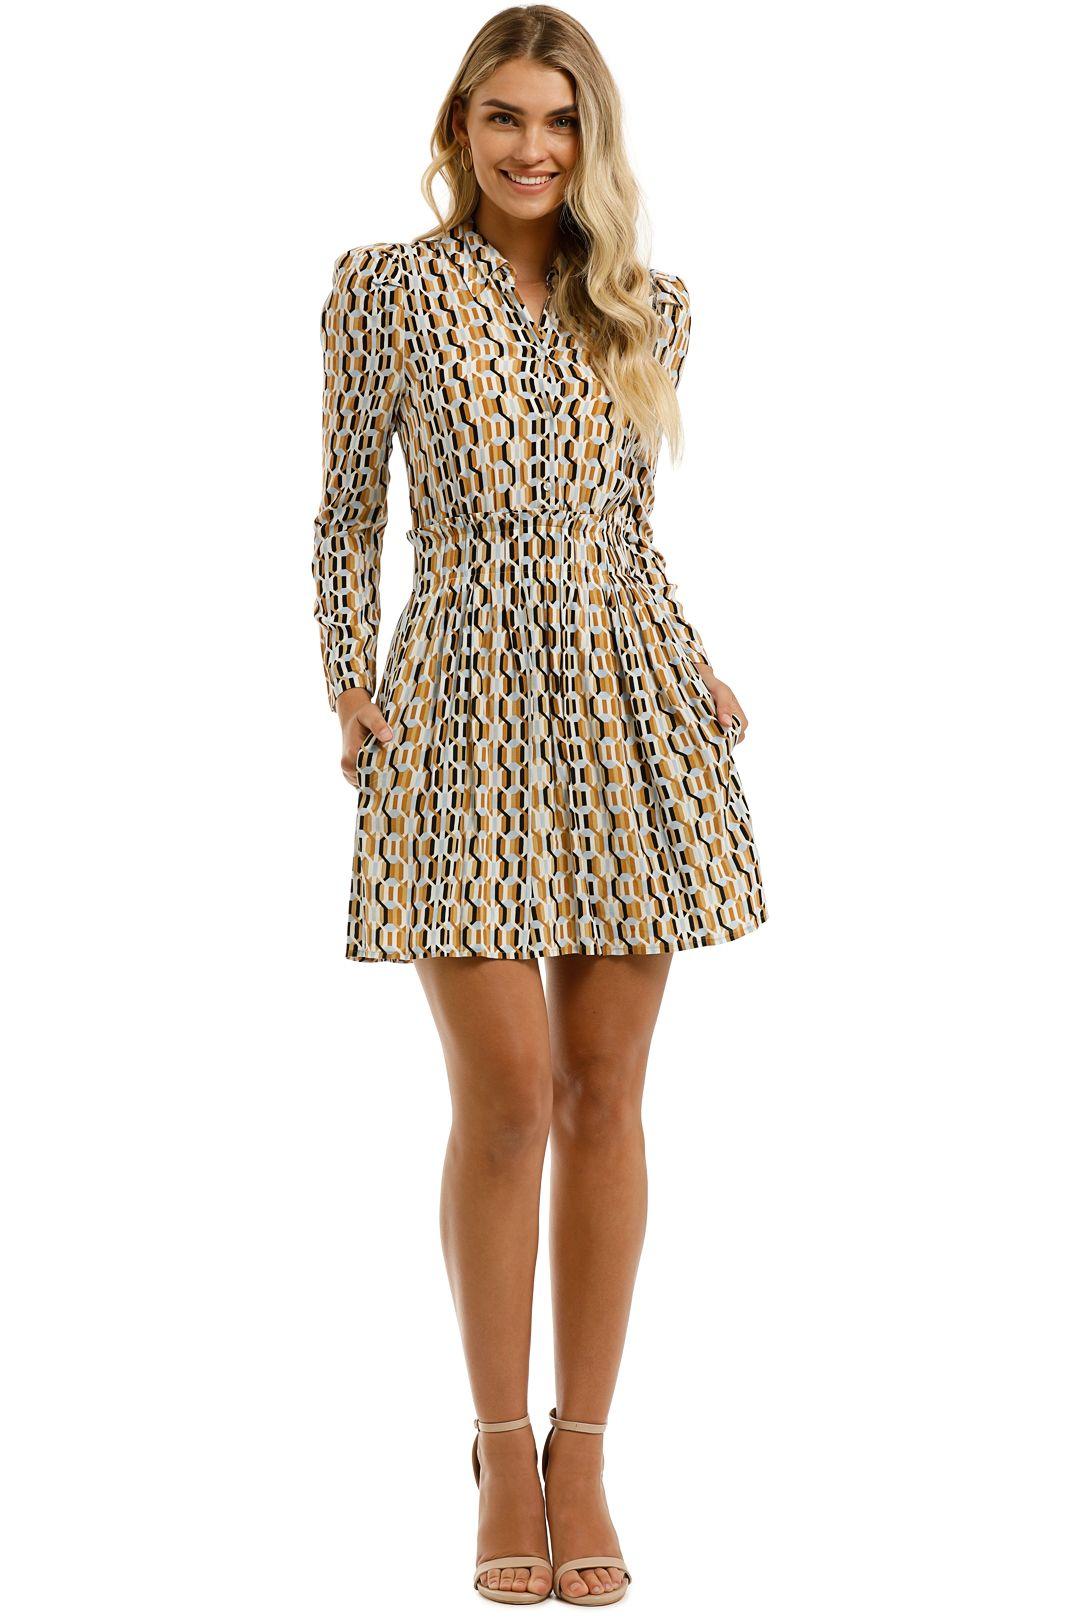 Maje-Rikole-Dress-Print-Front